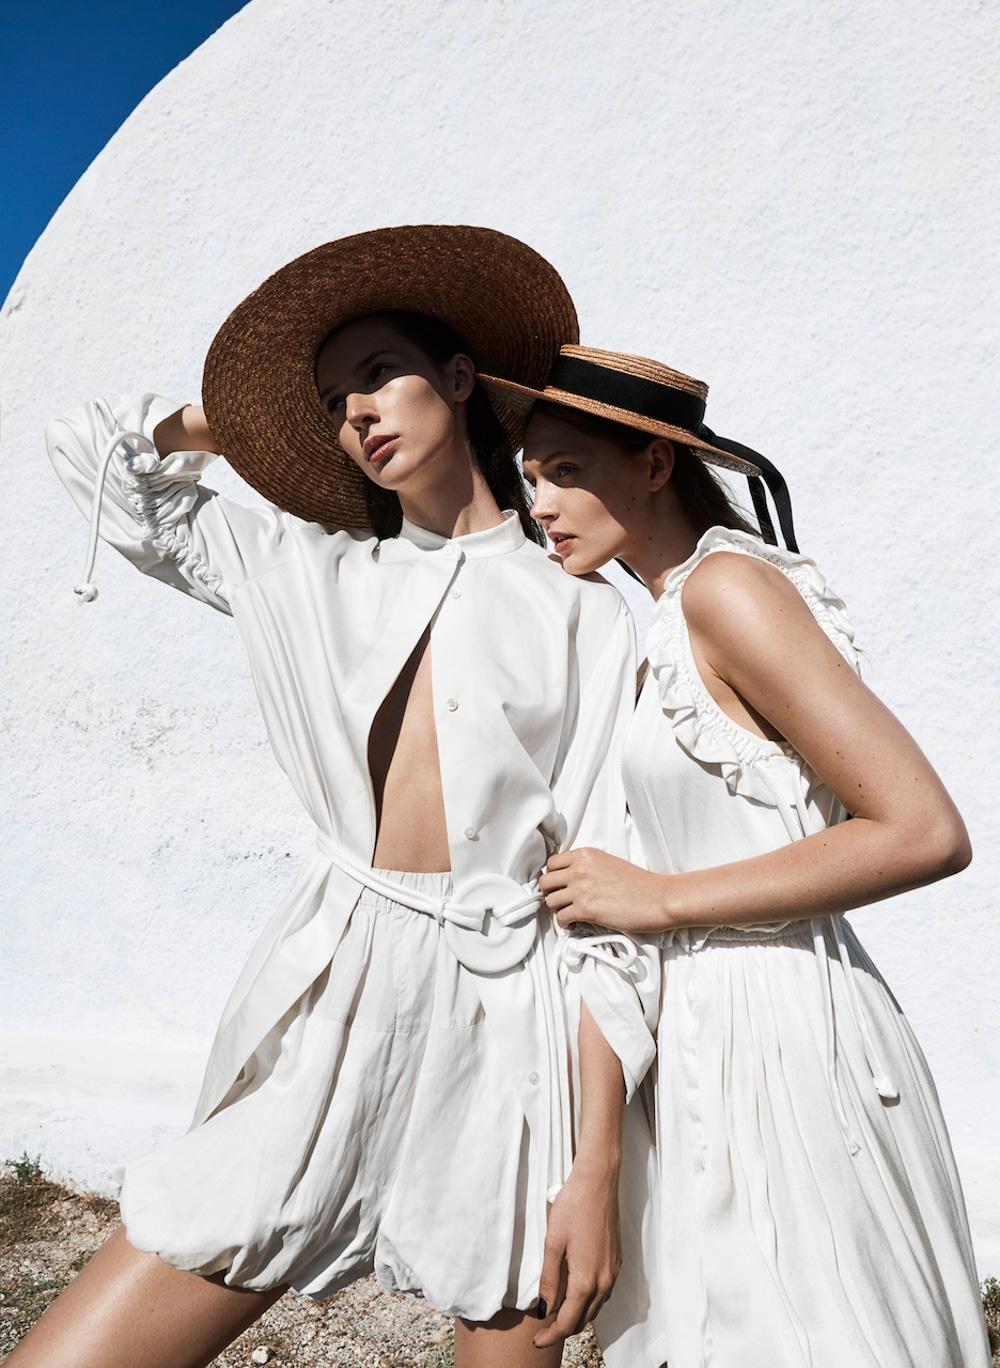 Viva-Magazine-July-2017-Angelika-Maciołek-and-Karolina-Laczkowska-by-Mateusz-Stankiewicz-1.jpg